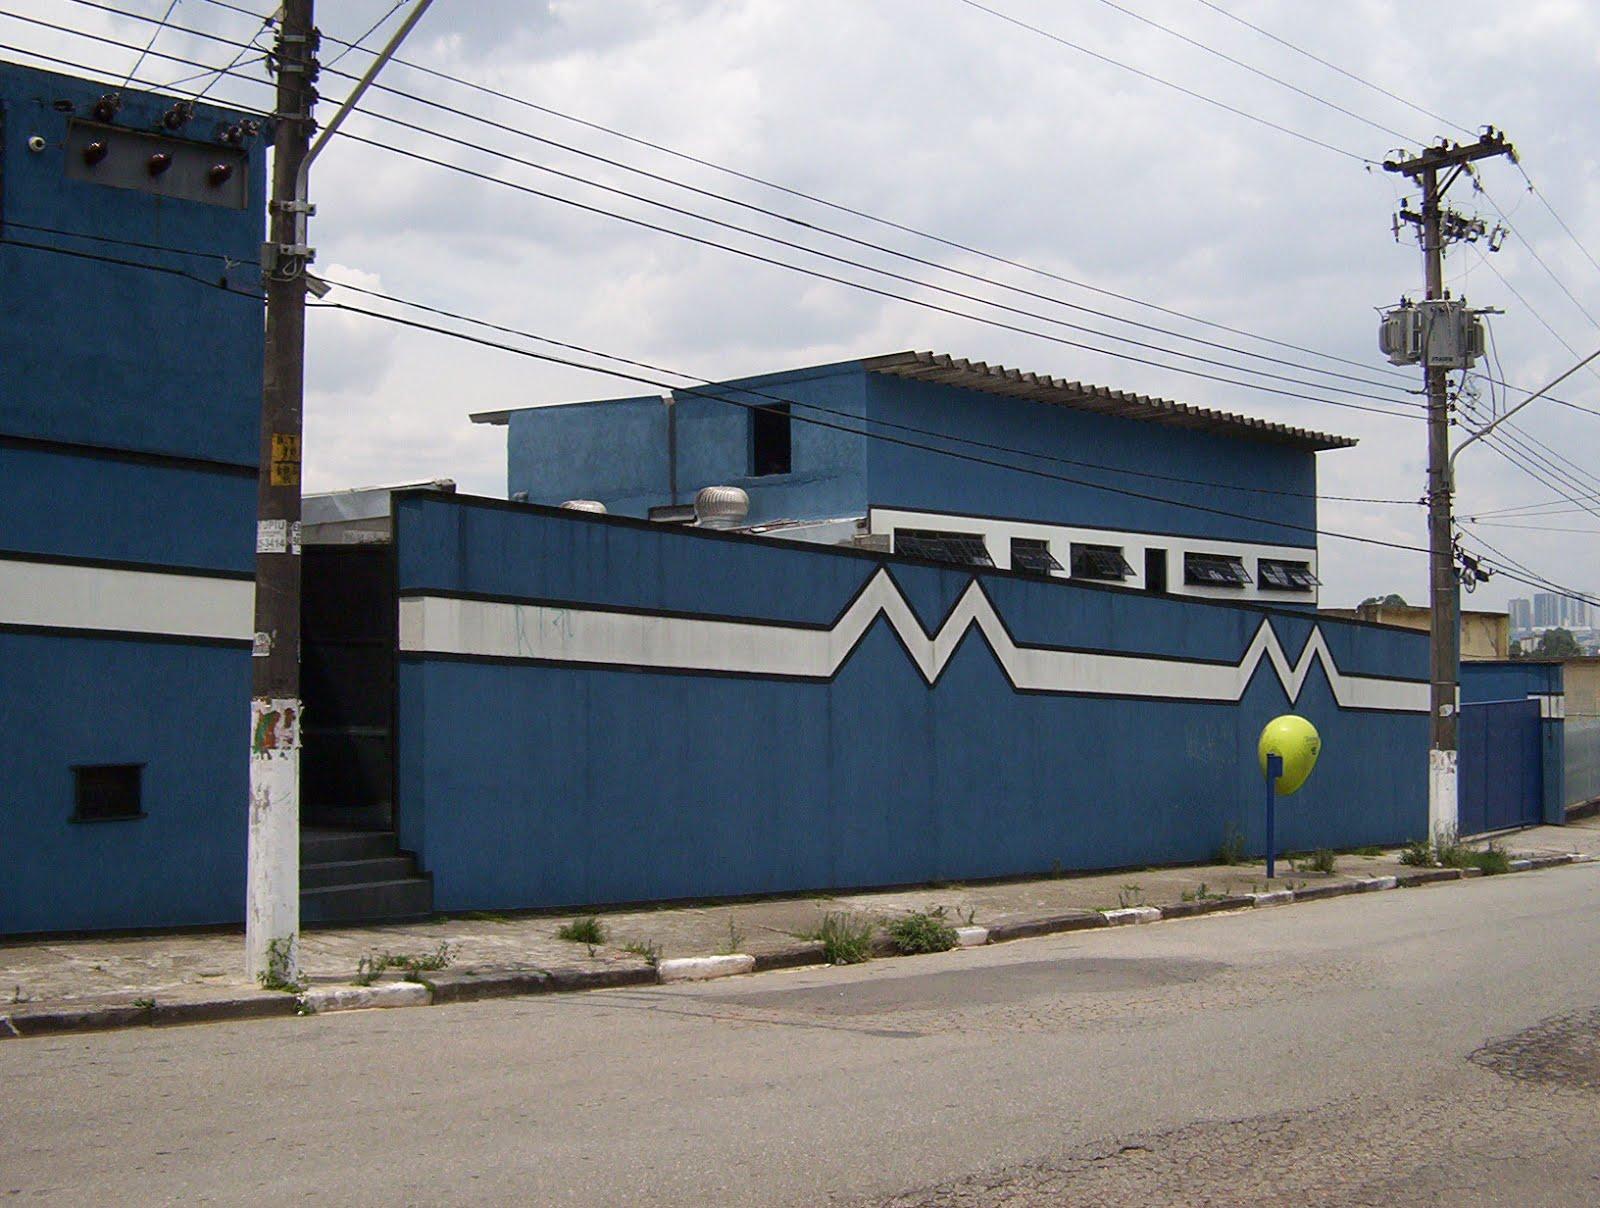 MARKIMPLAST Indústria e Comércio de Plásticos Ltda